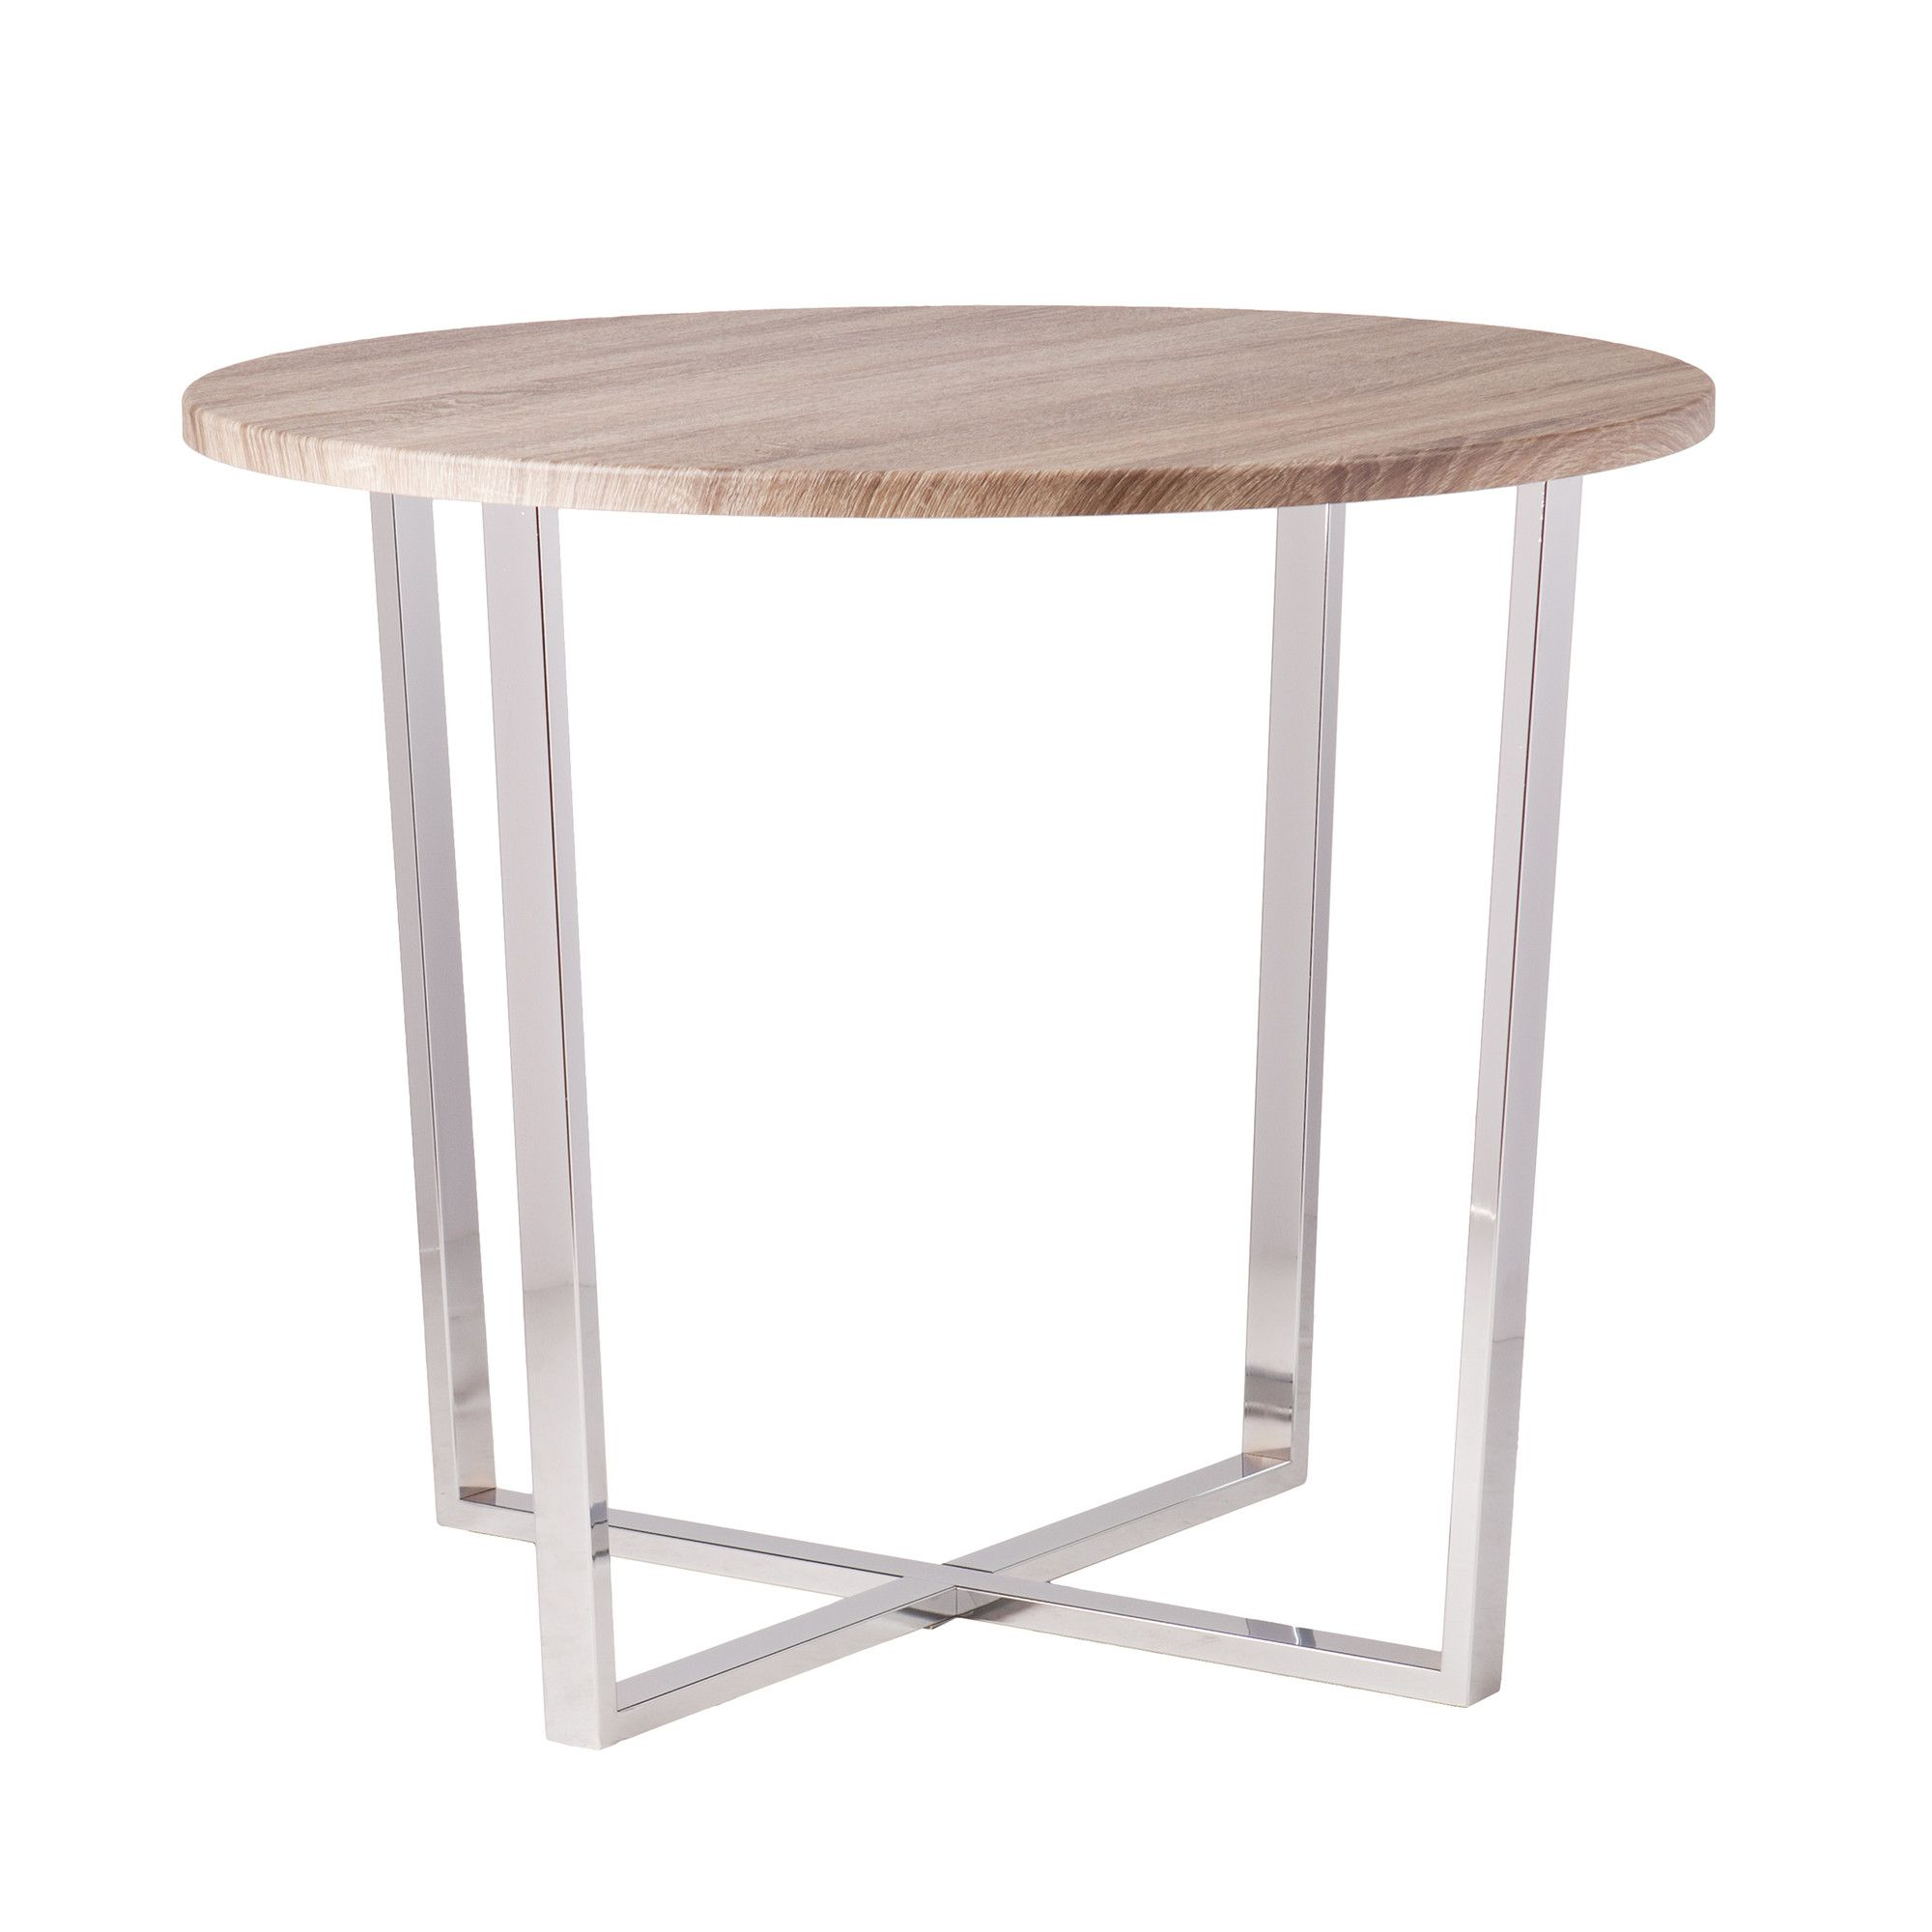 Millennium Park Dining Table